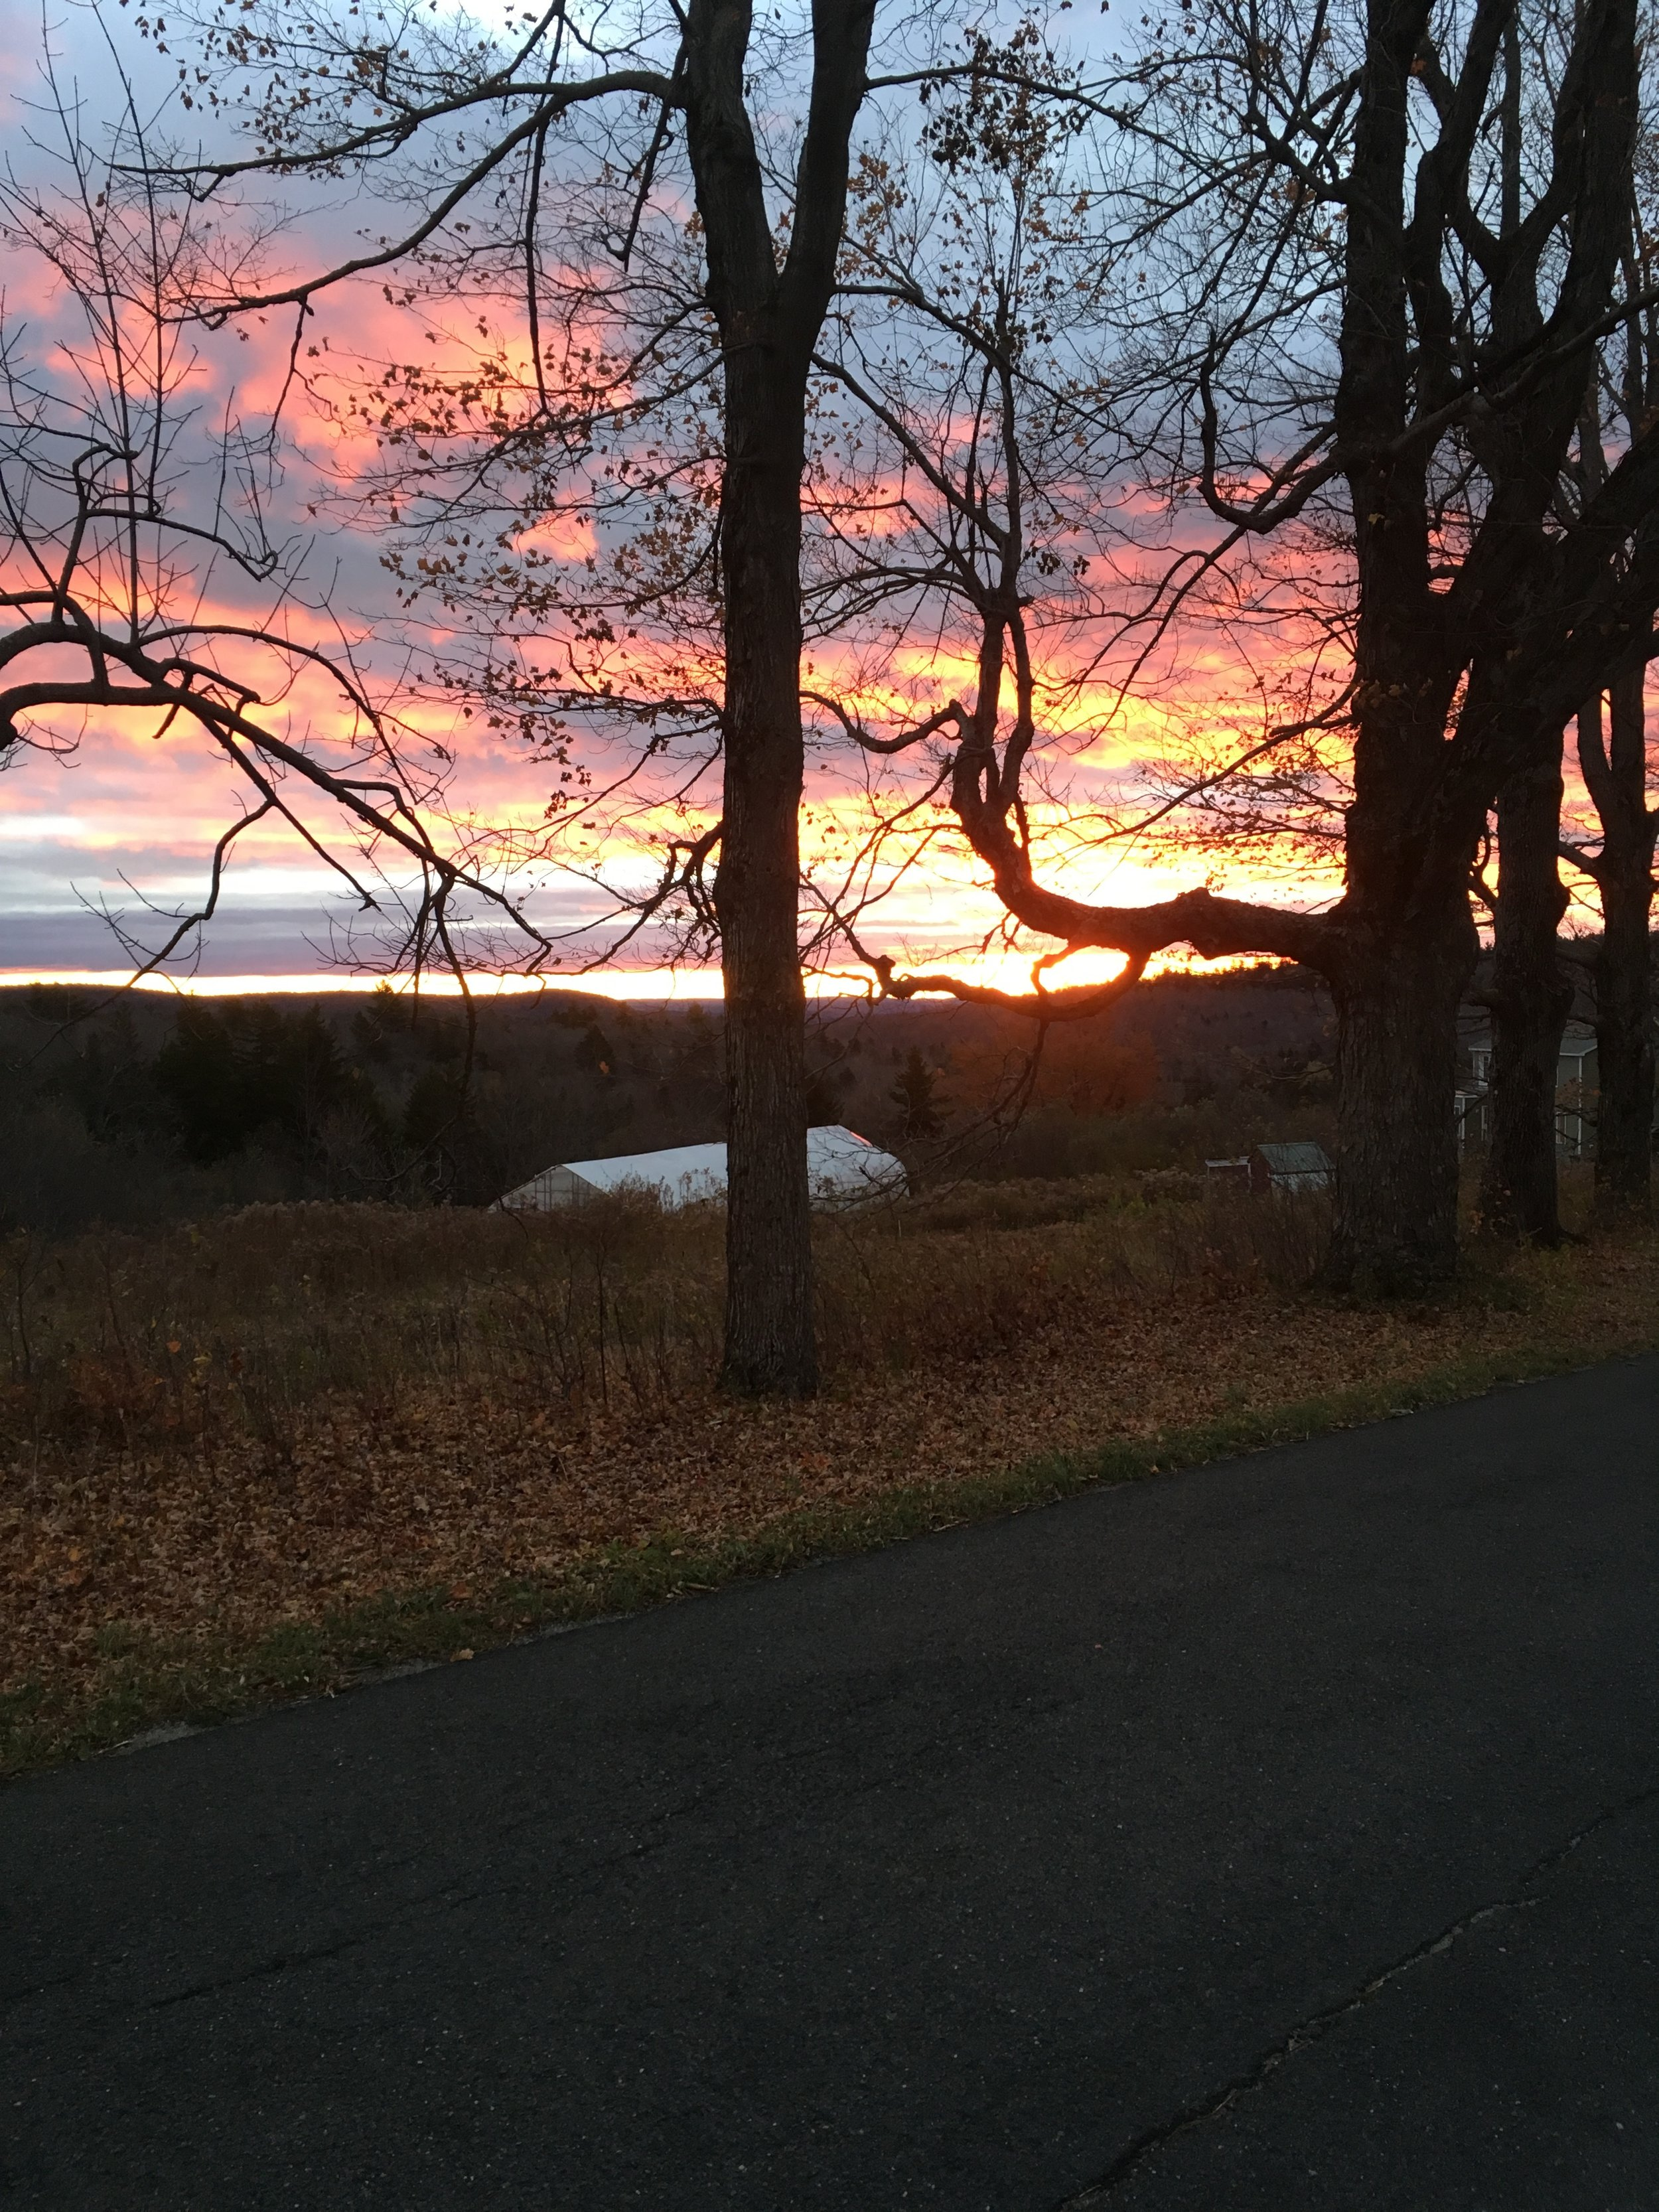 Sunrise, East Windsor Rd, Late October